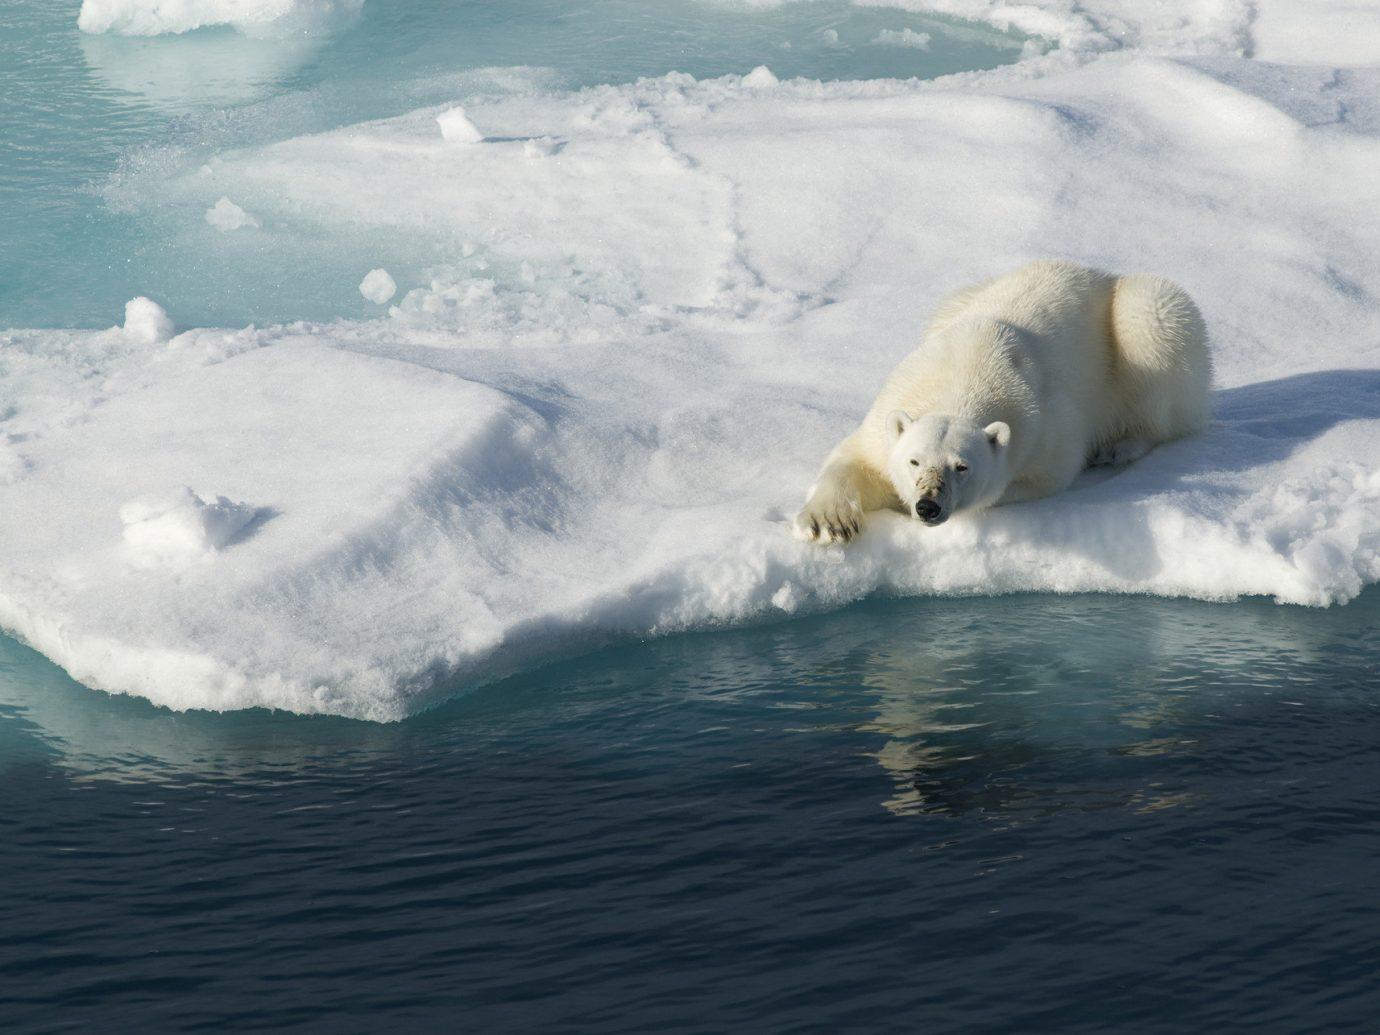 Trip Ideas outdoor water polar bear mammal arctic bear Ocean arctic ocean Sea wind wave wave water sport Nature surfing ice iceberg